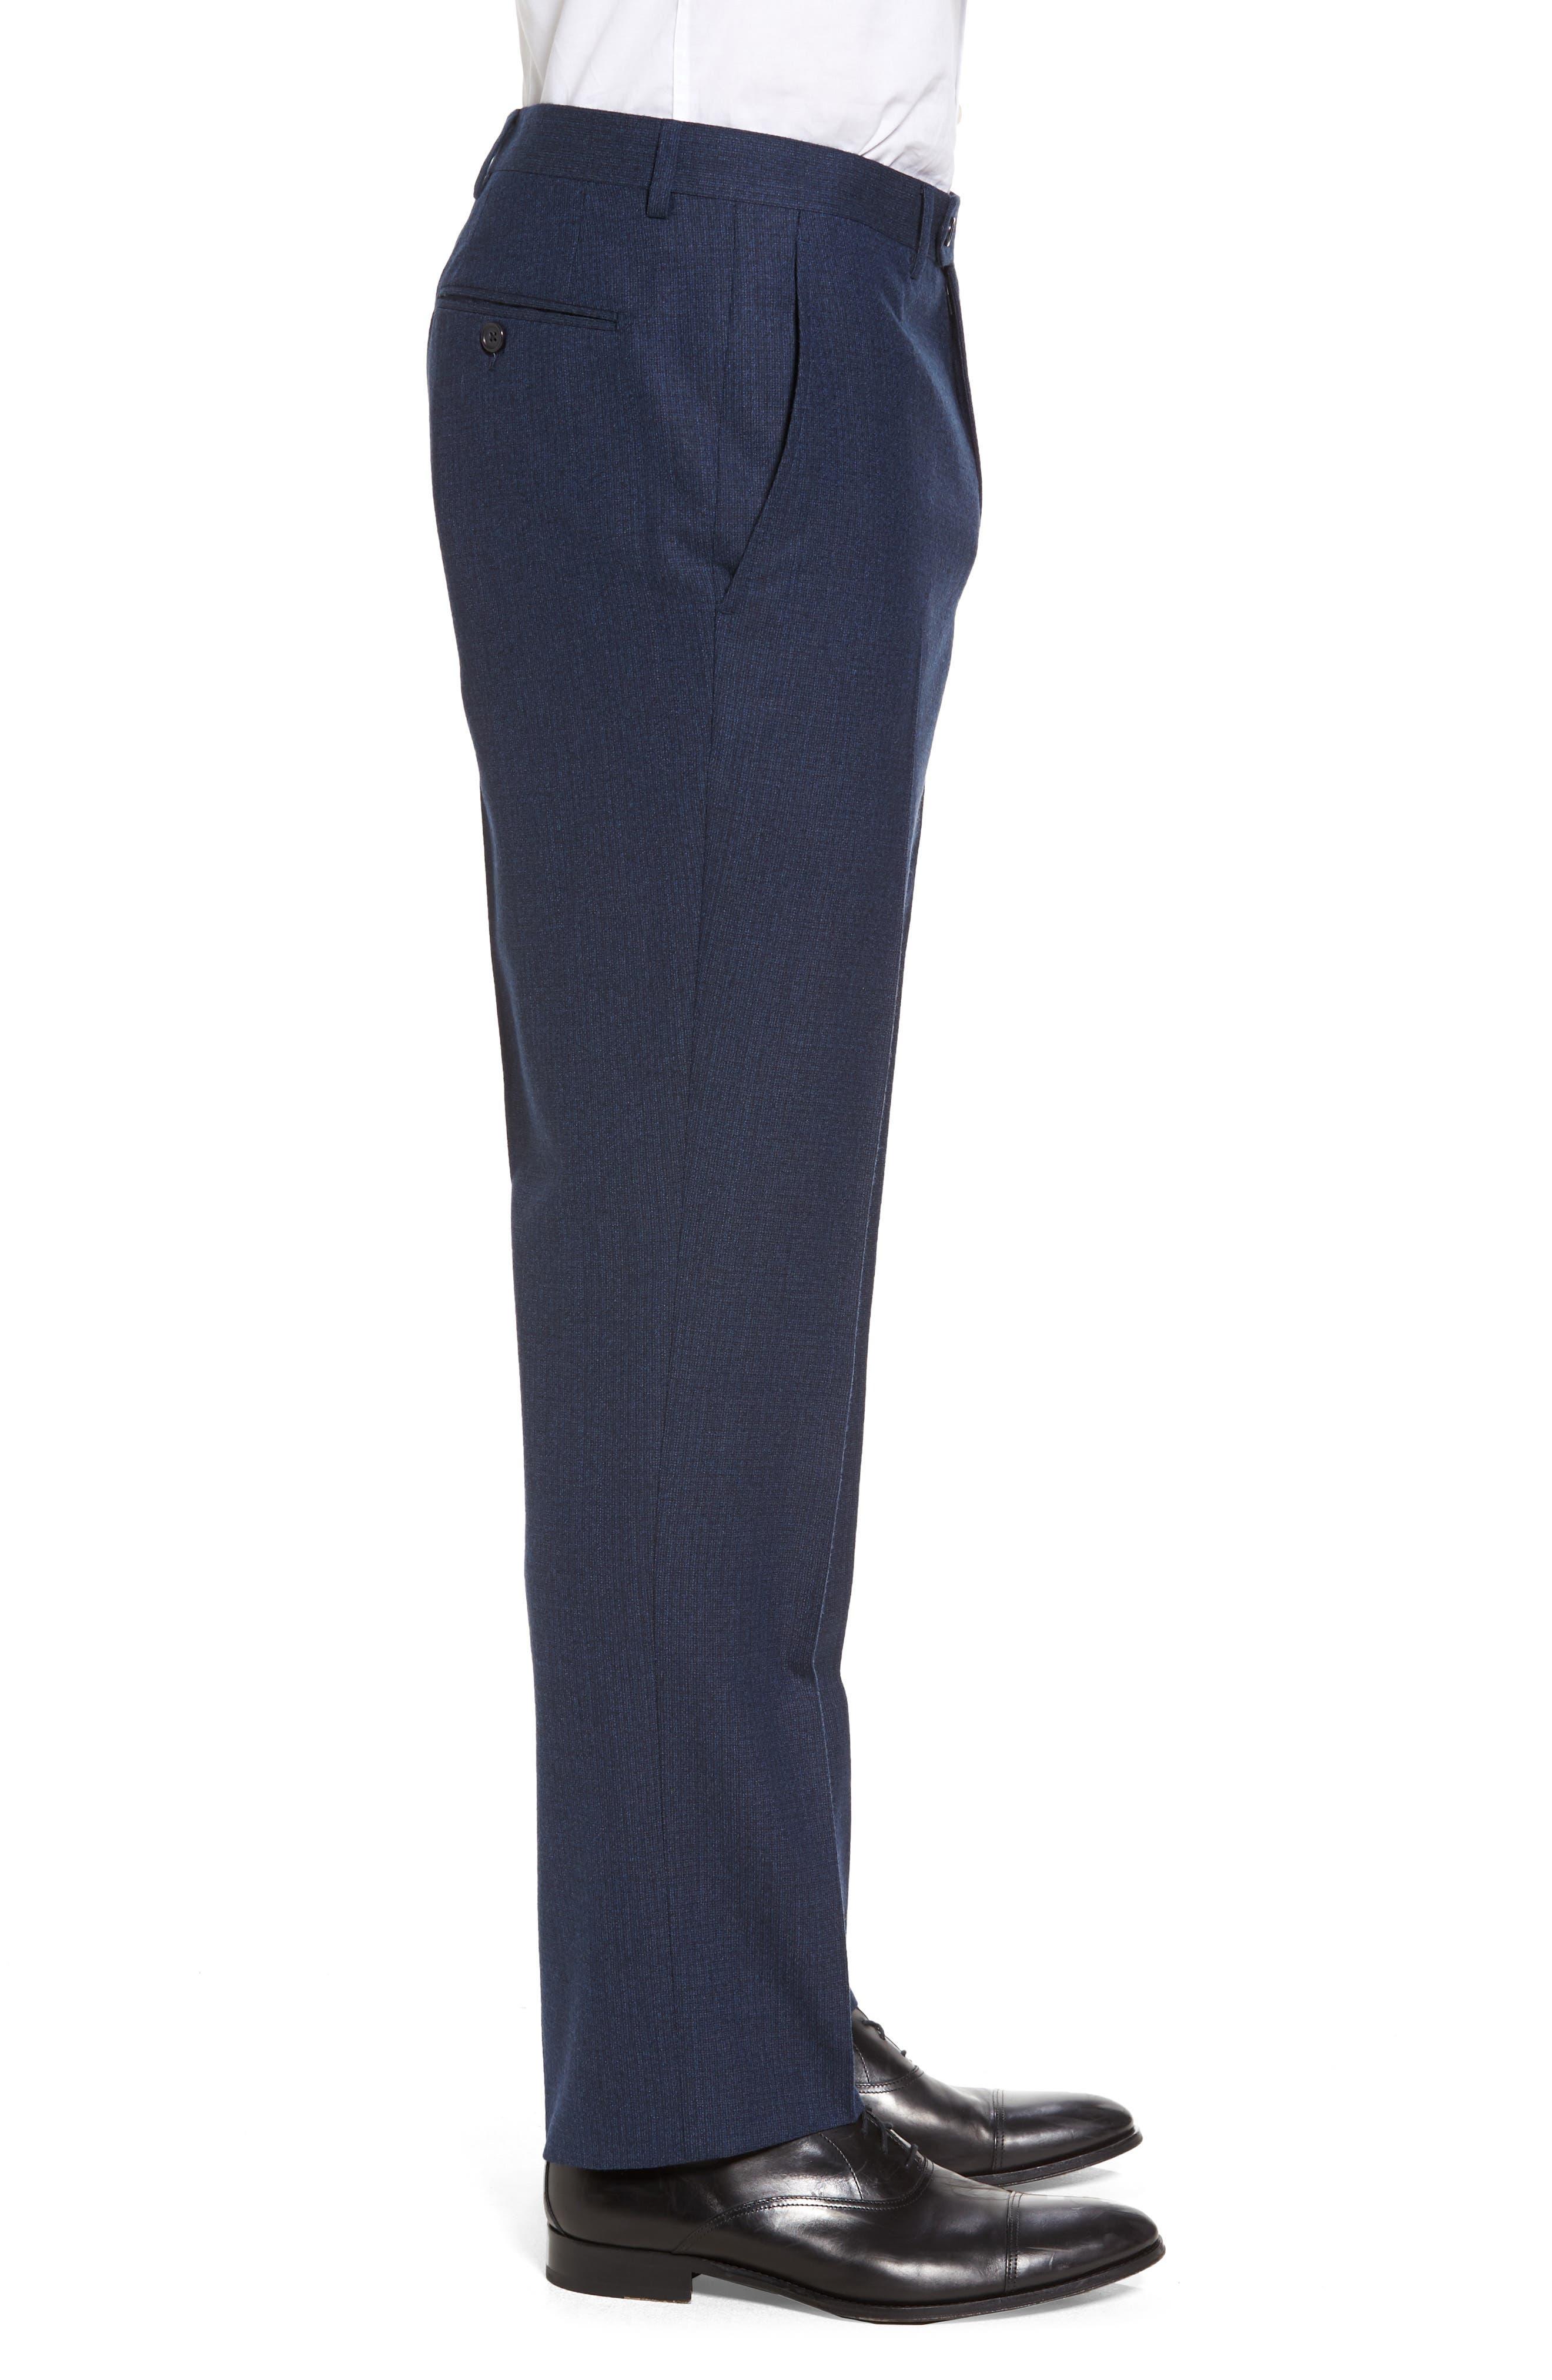 Alternate Image 3  - Santorelli Romero Regular Fit Flat Front Trousers